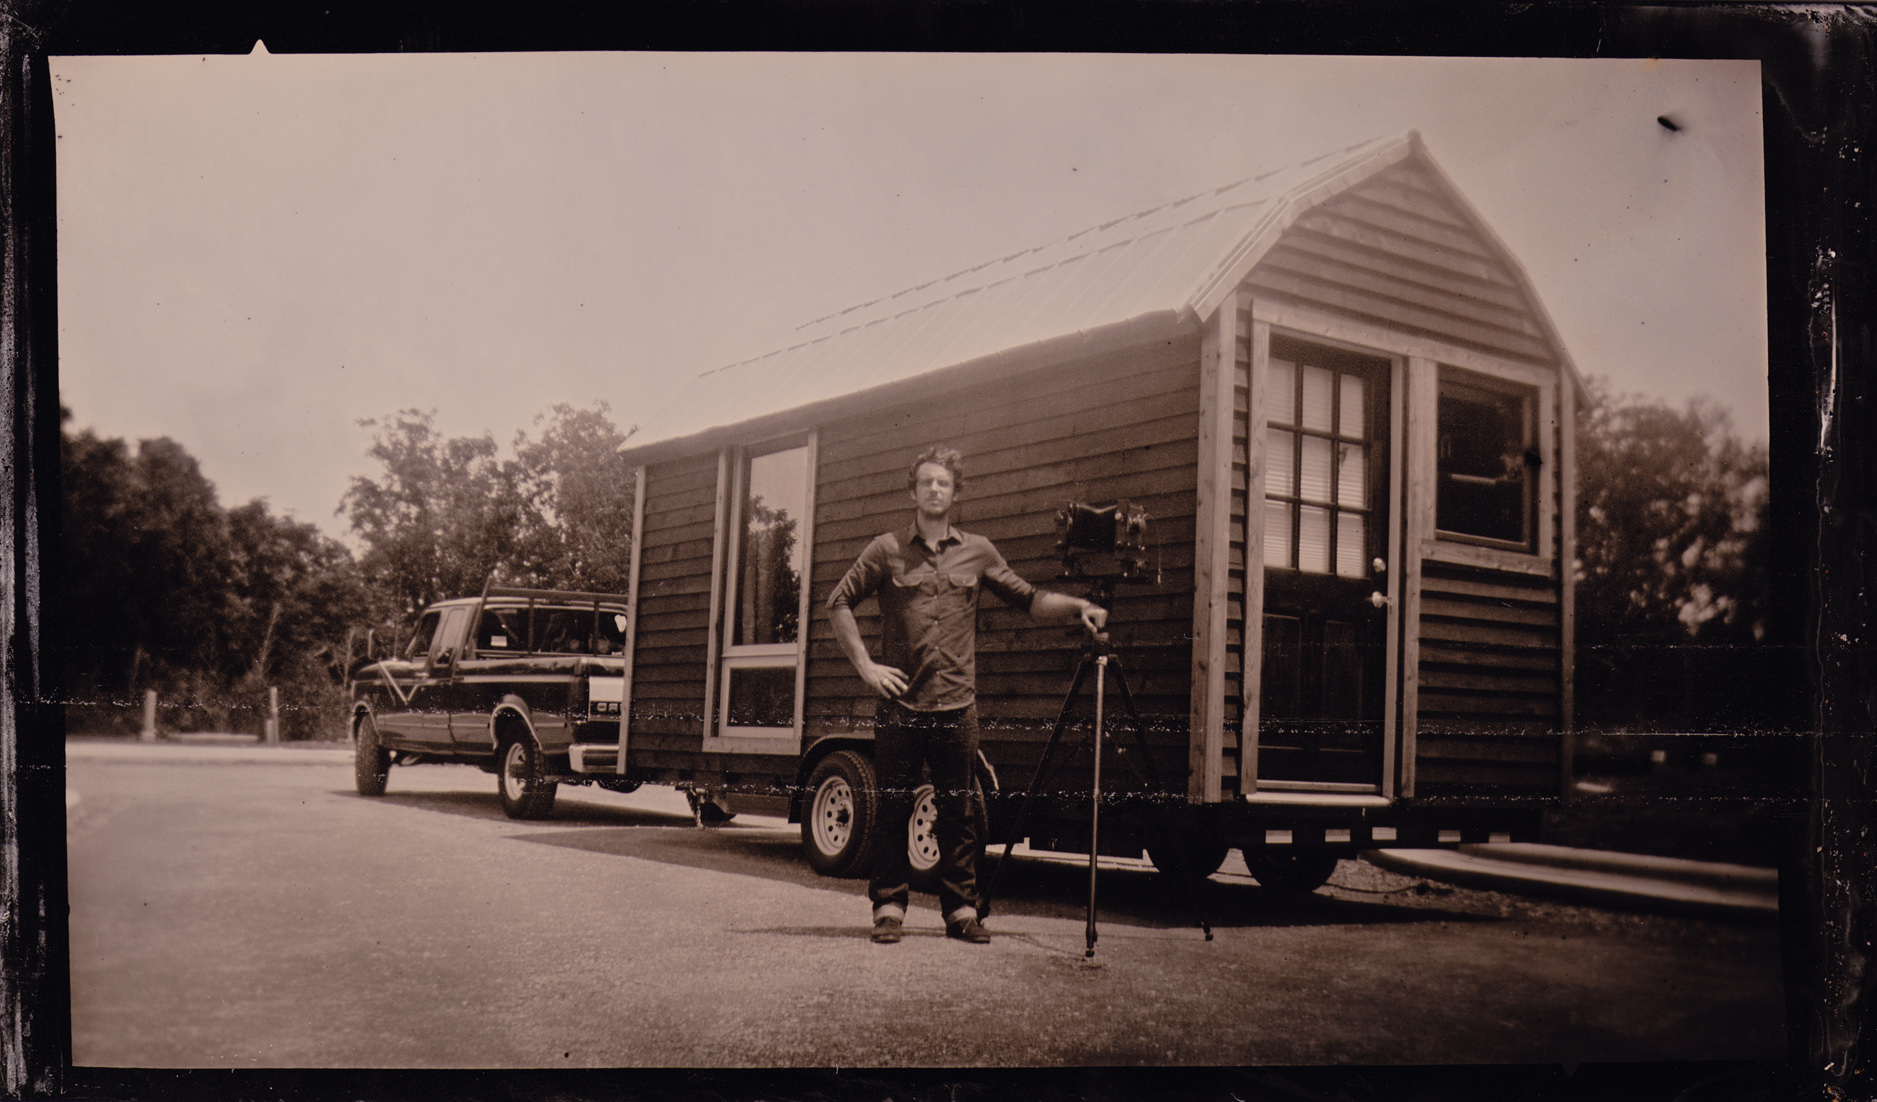 Lumiere's traveling Tintype Studio and Darkroom